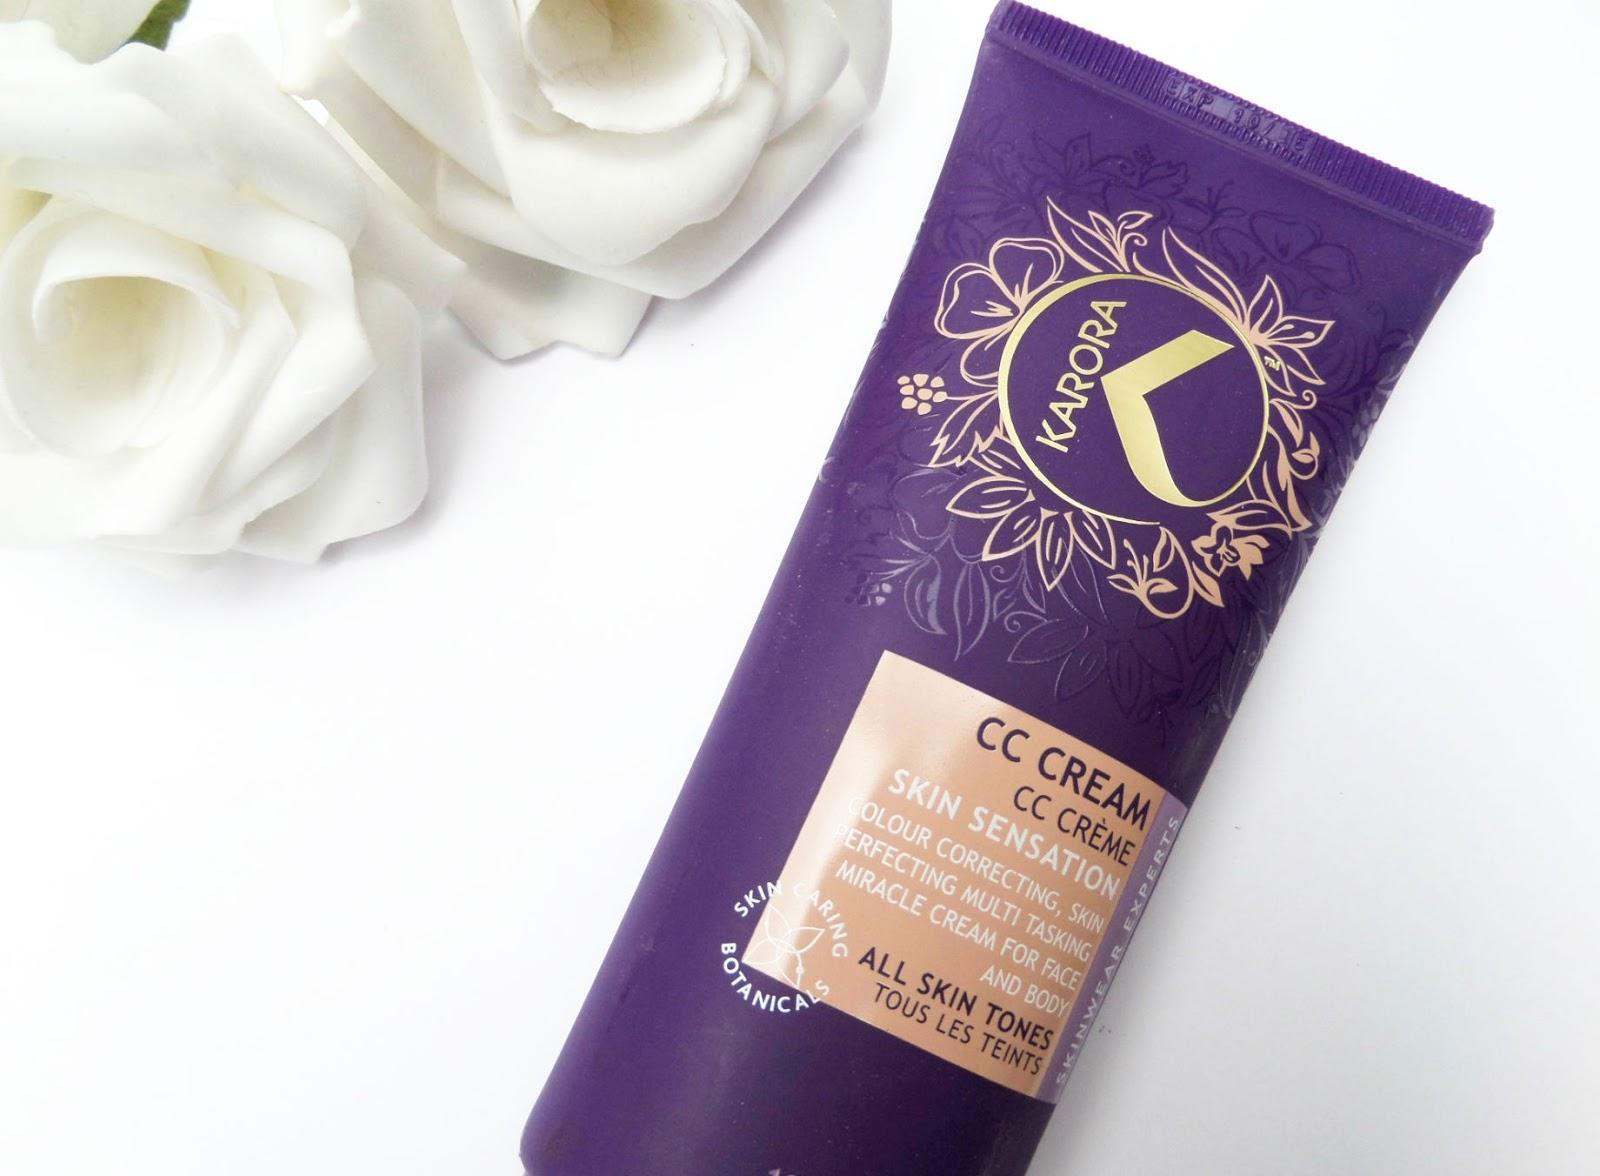 Karora Cosmetics CC Cream